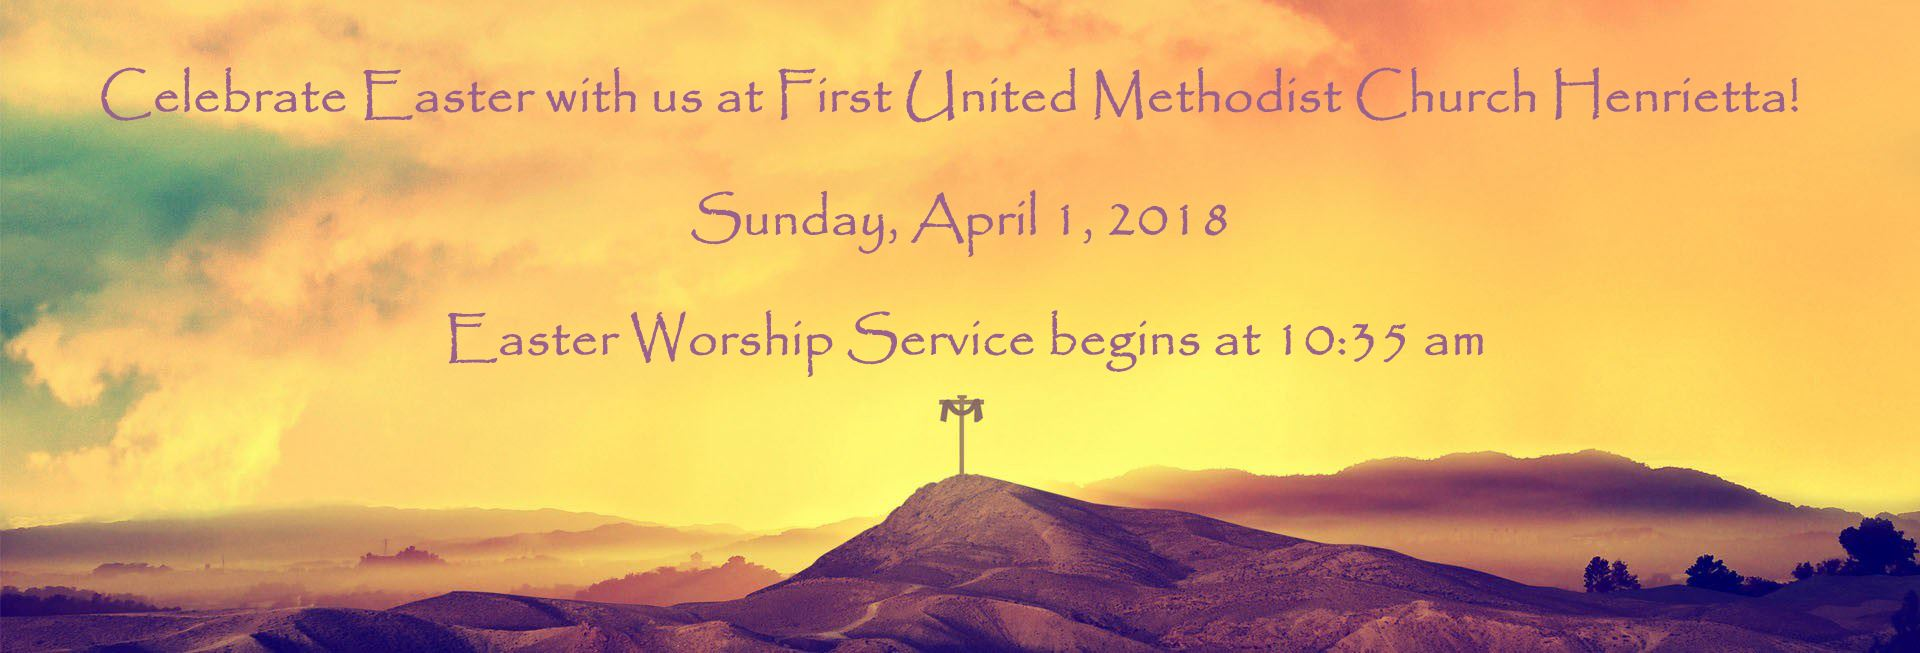 2018 Easter Sunday